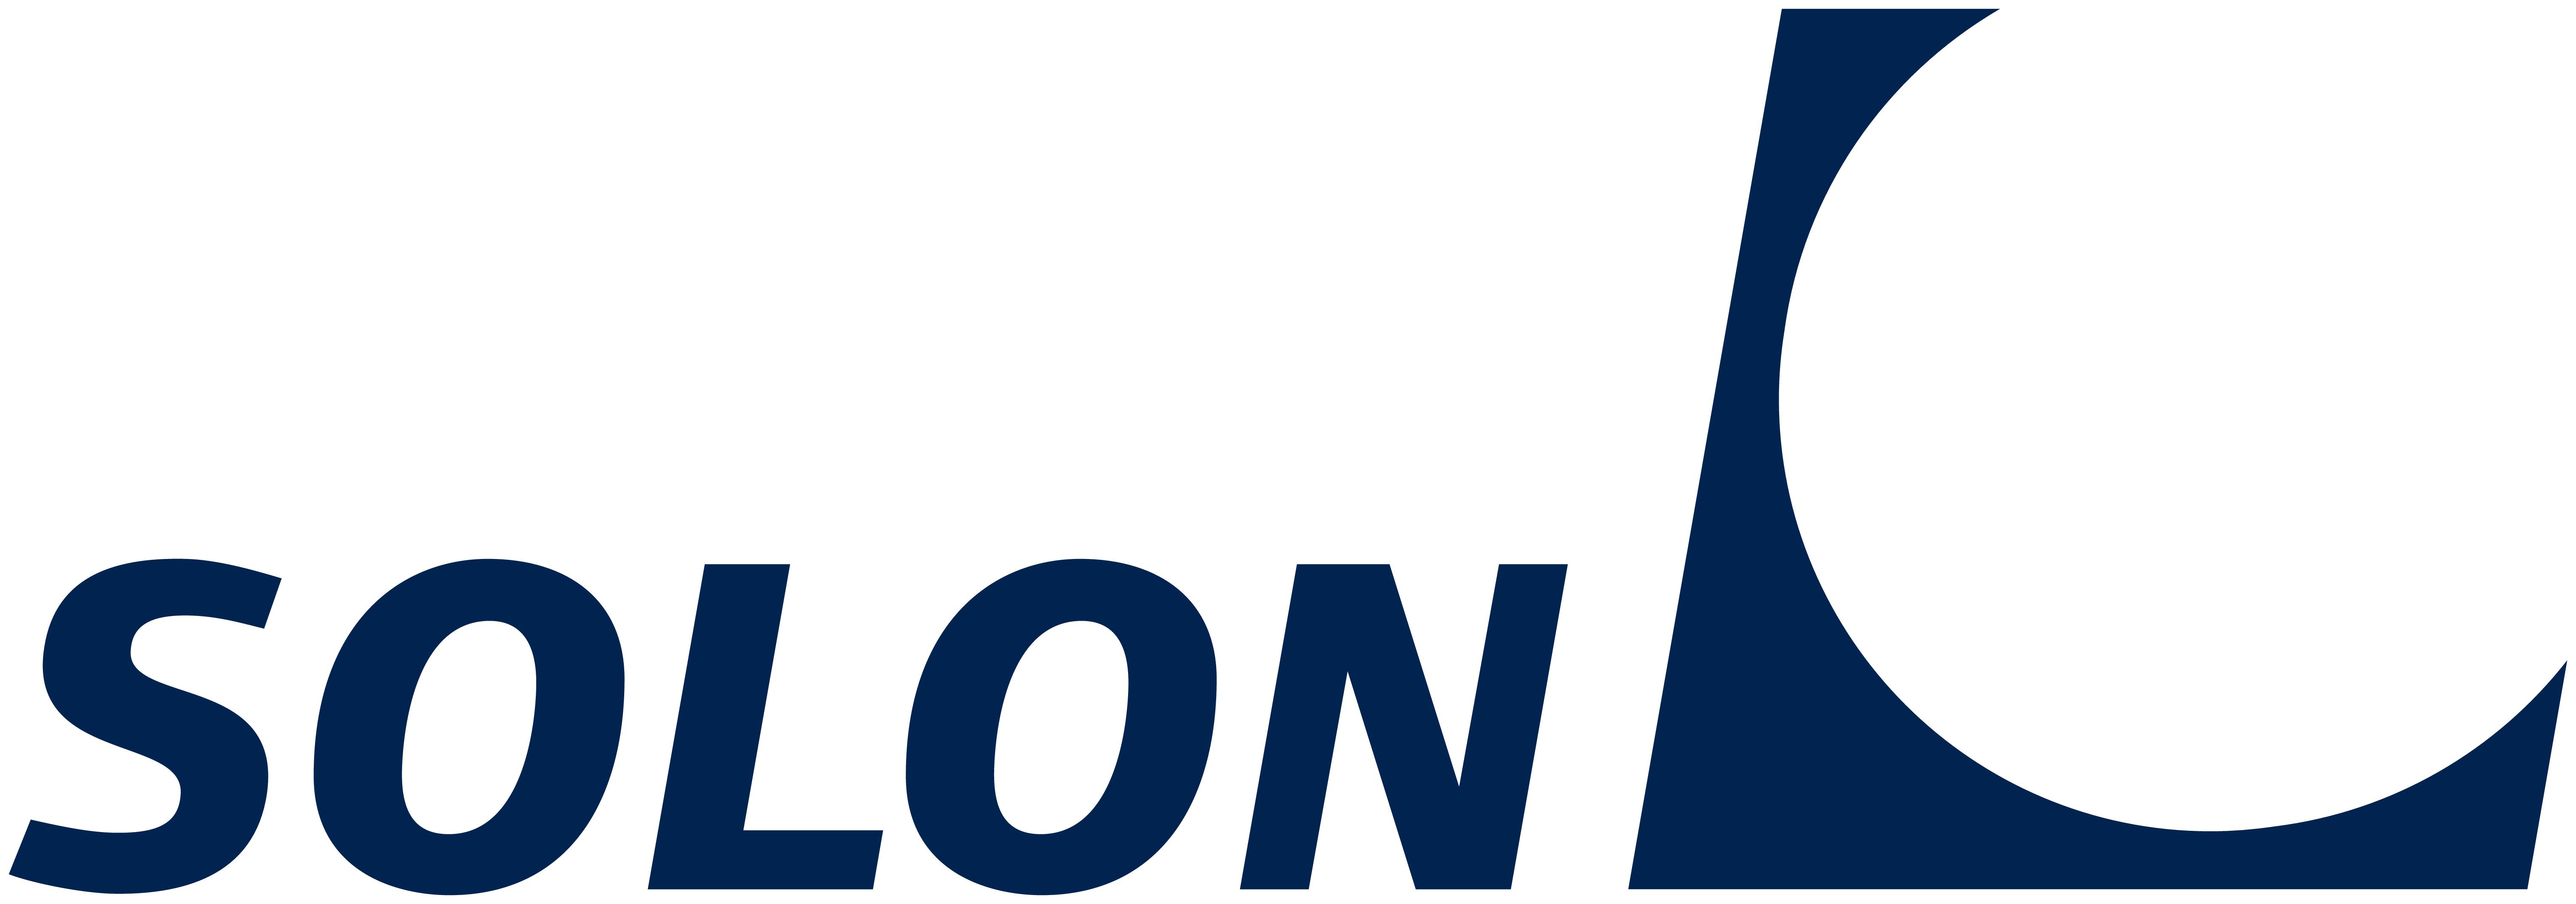 Solon Logo - Partnerships